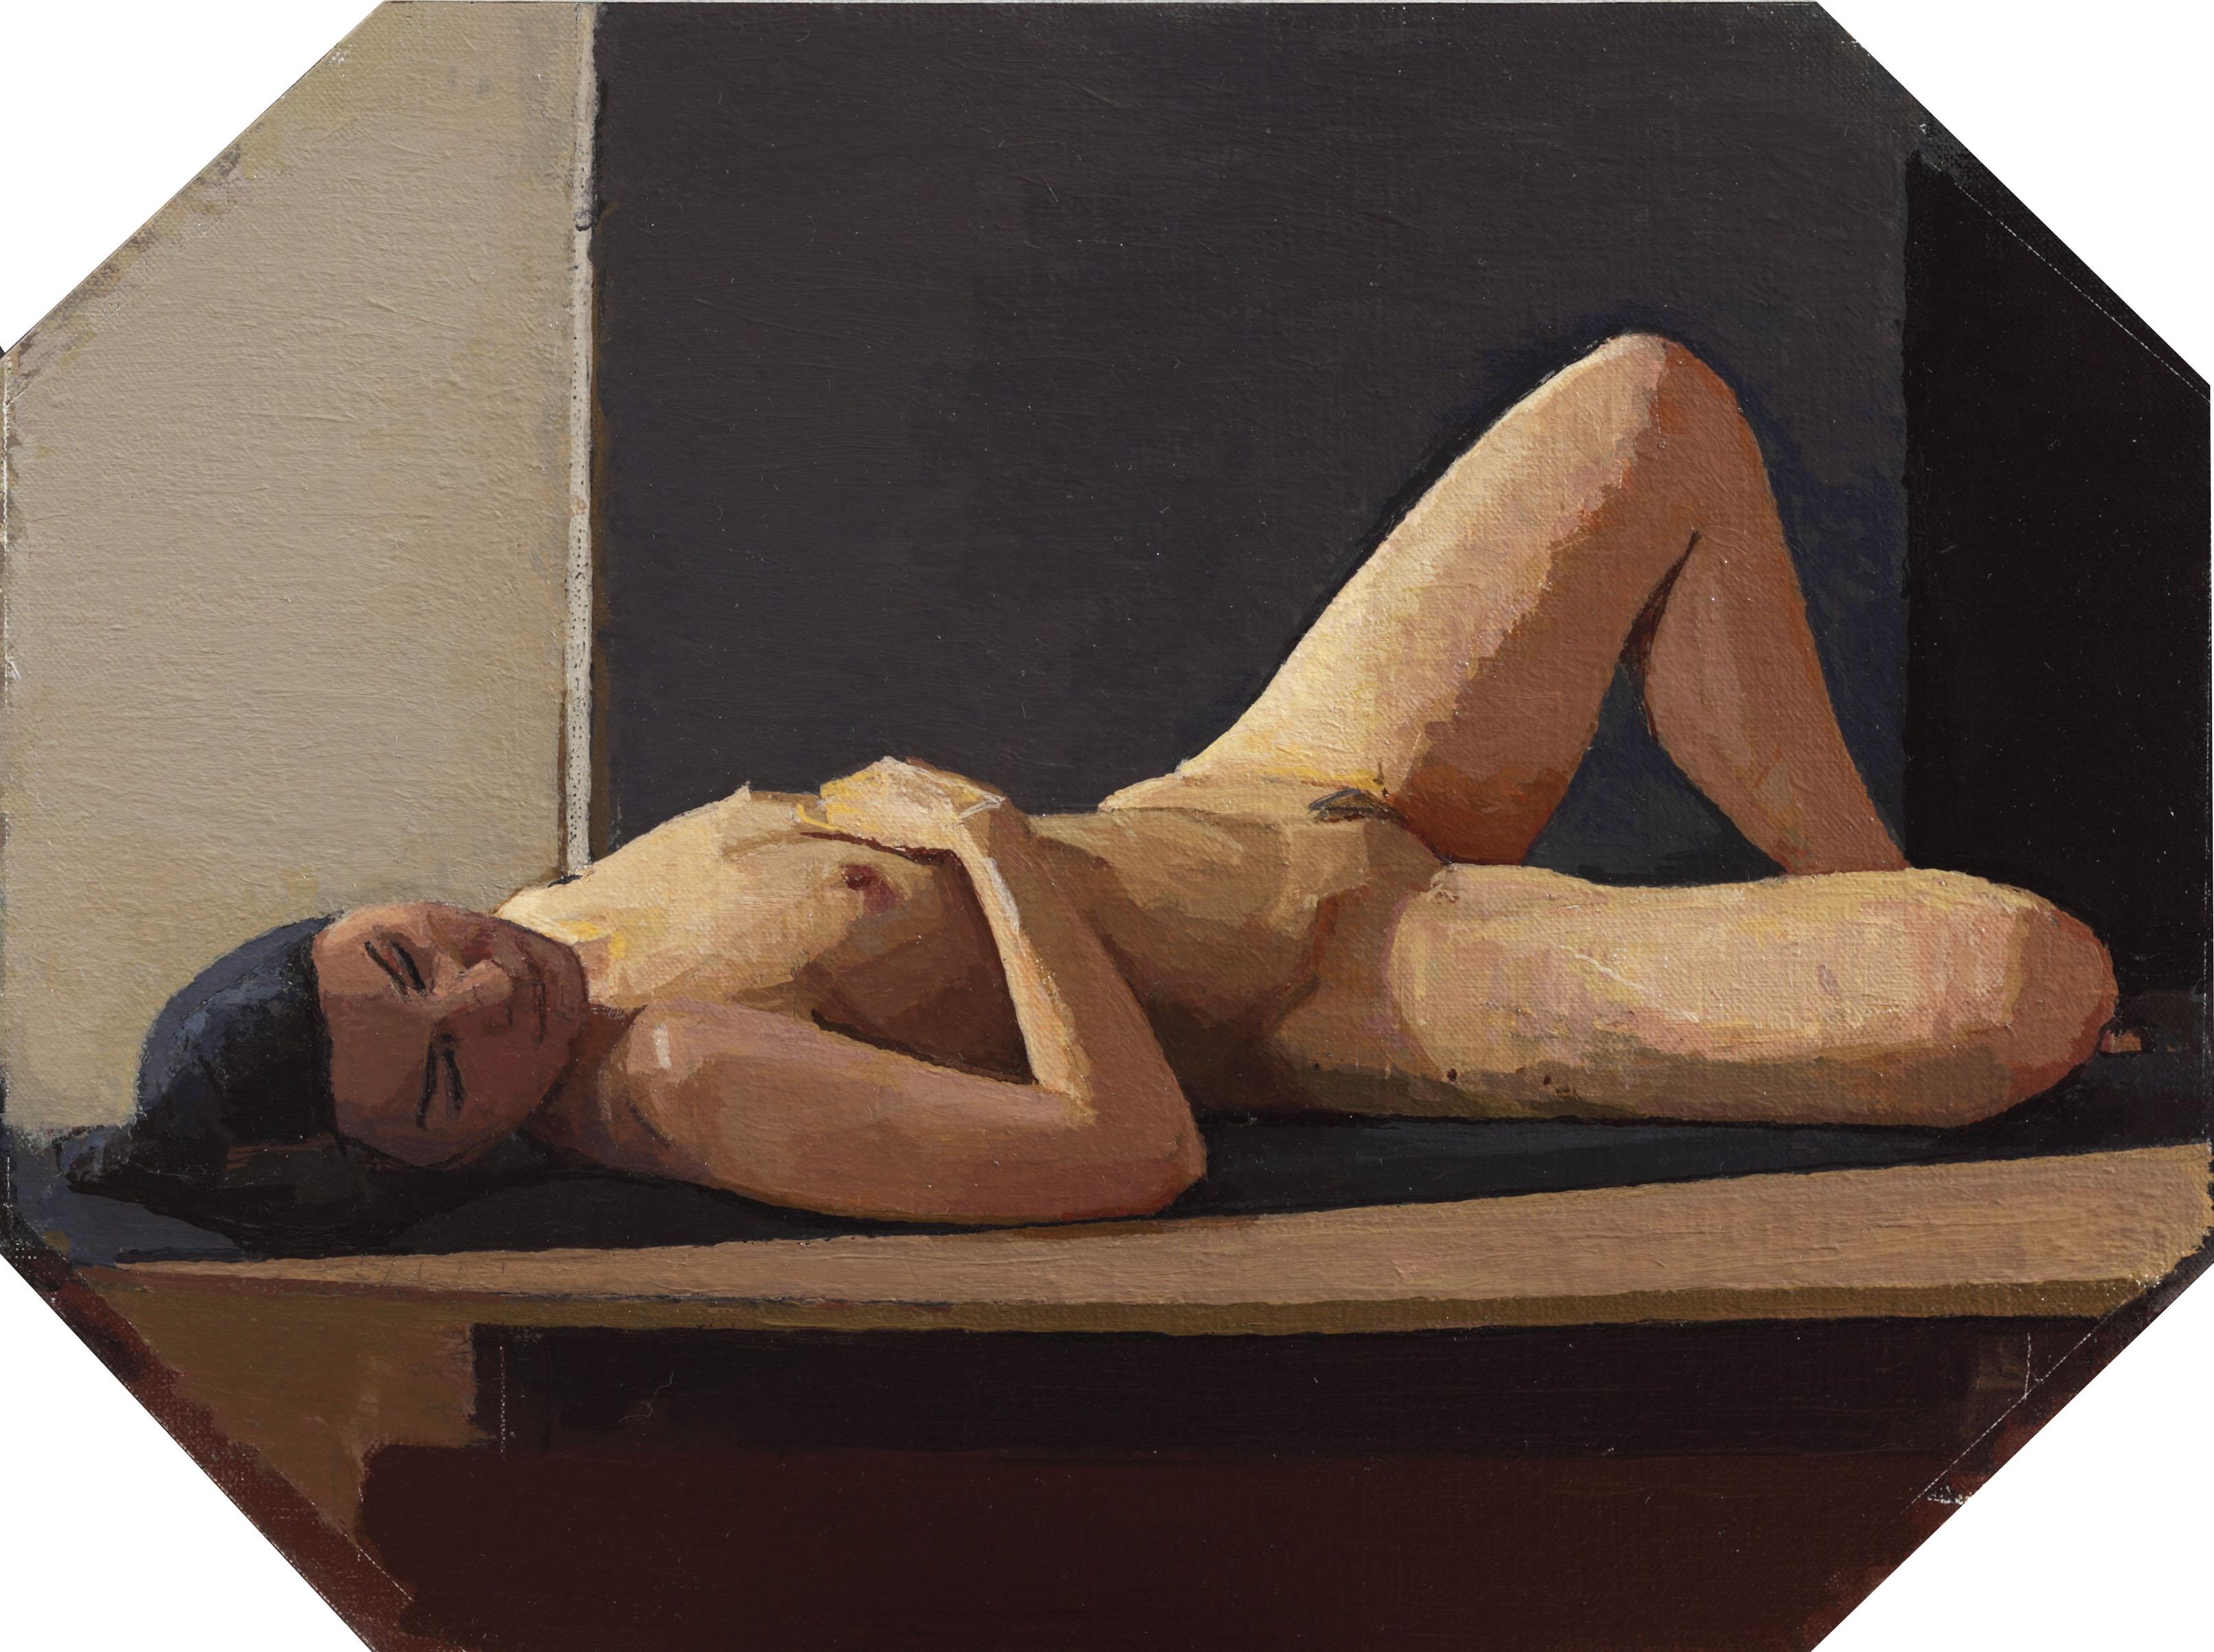 Octagonal nude, 2006-08